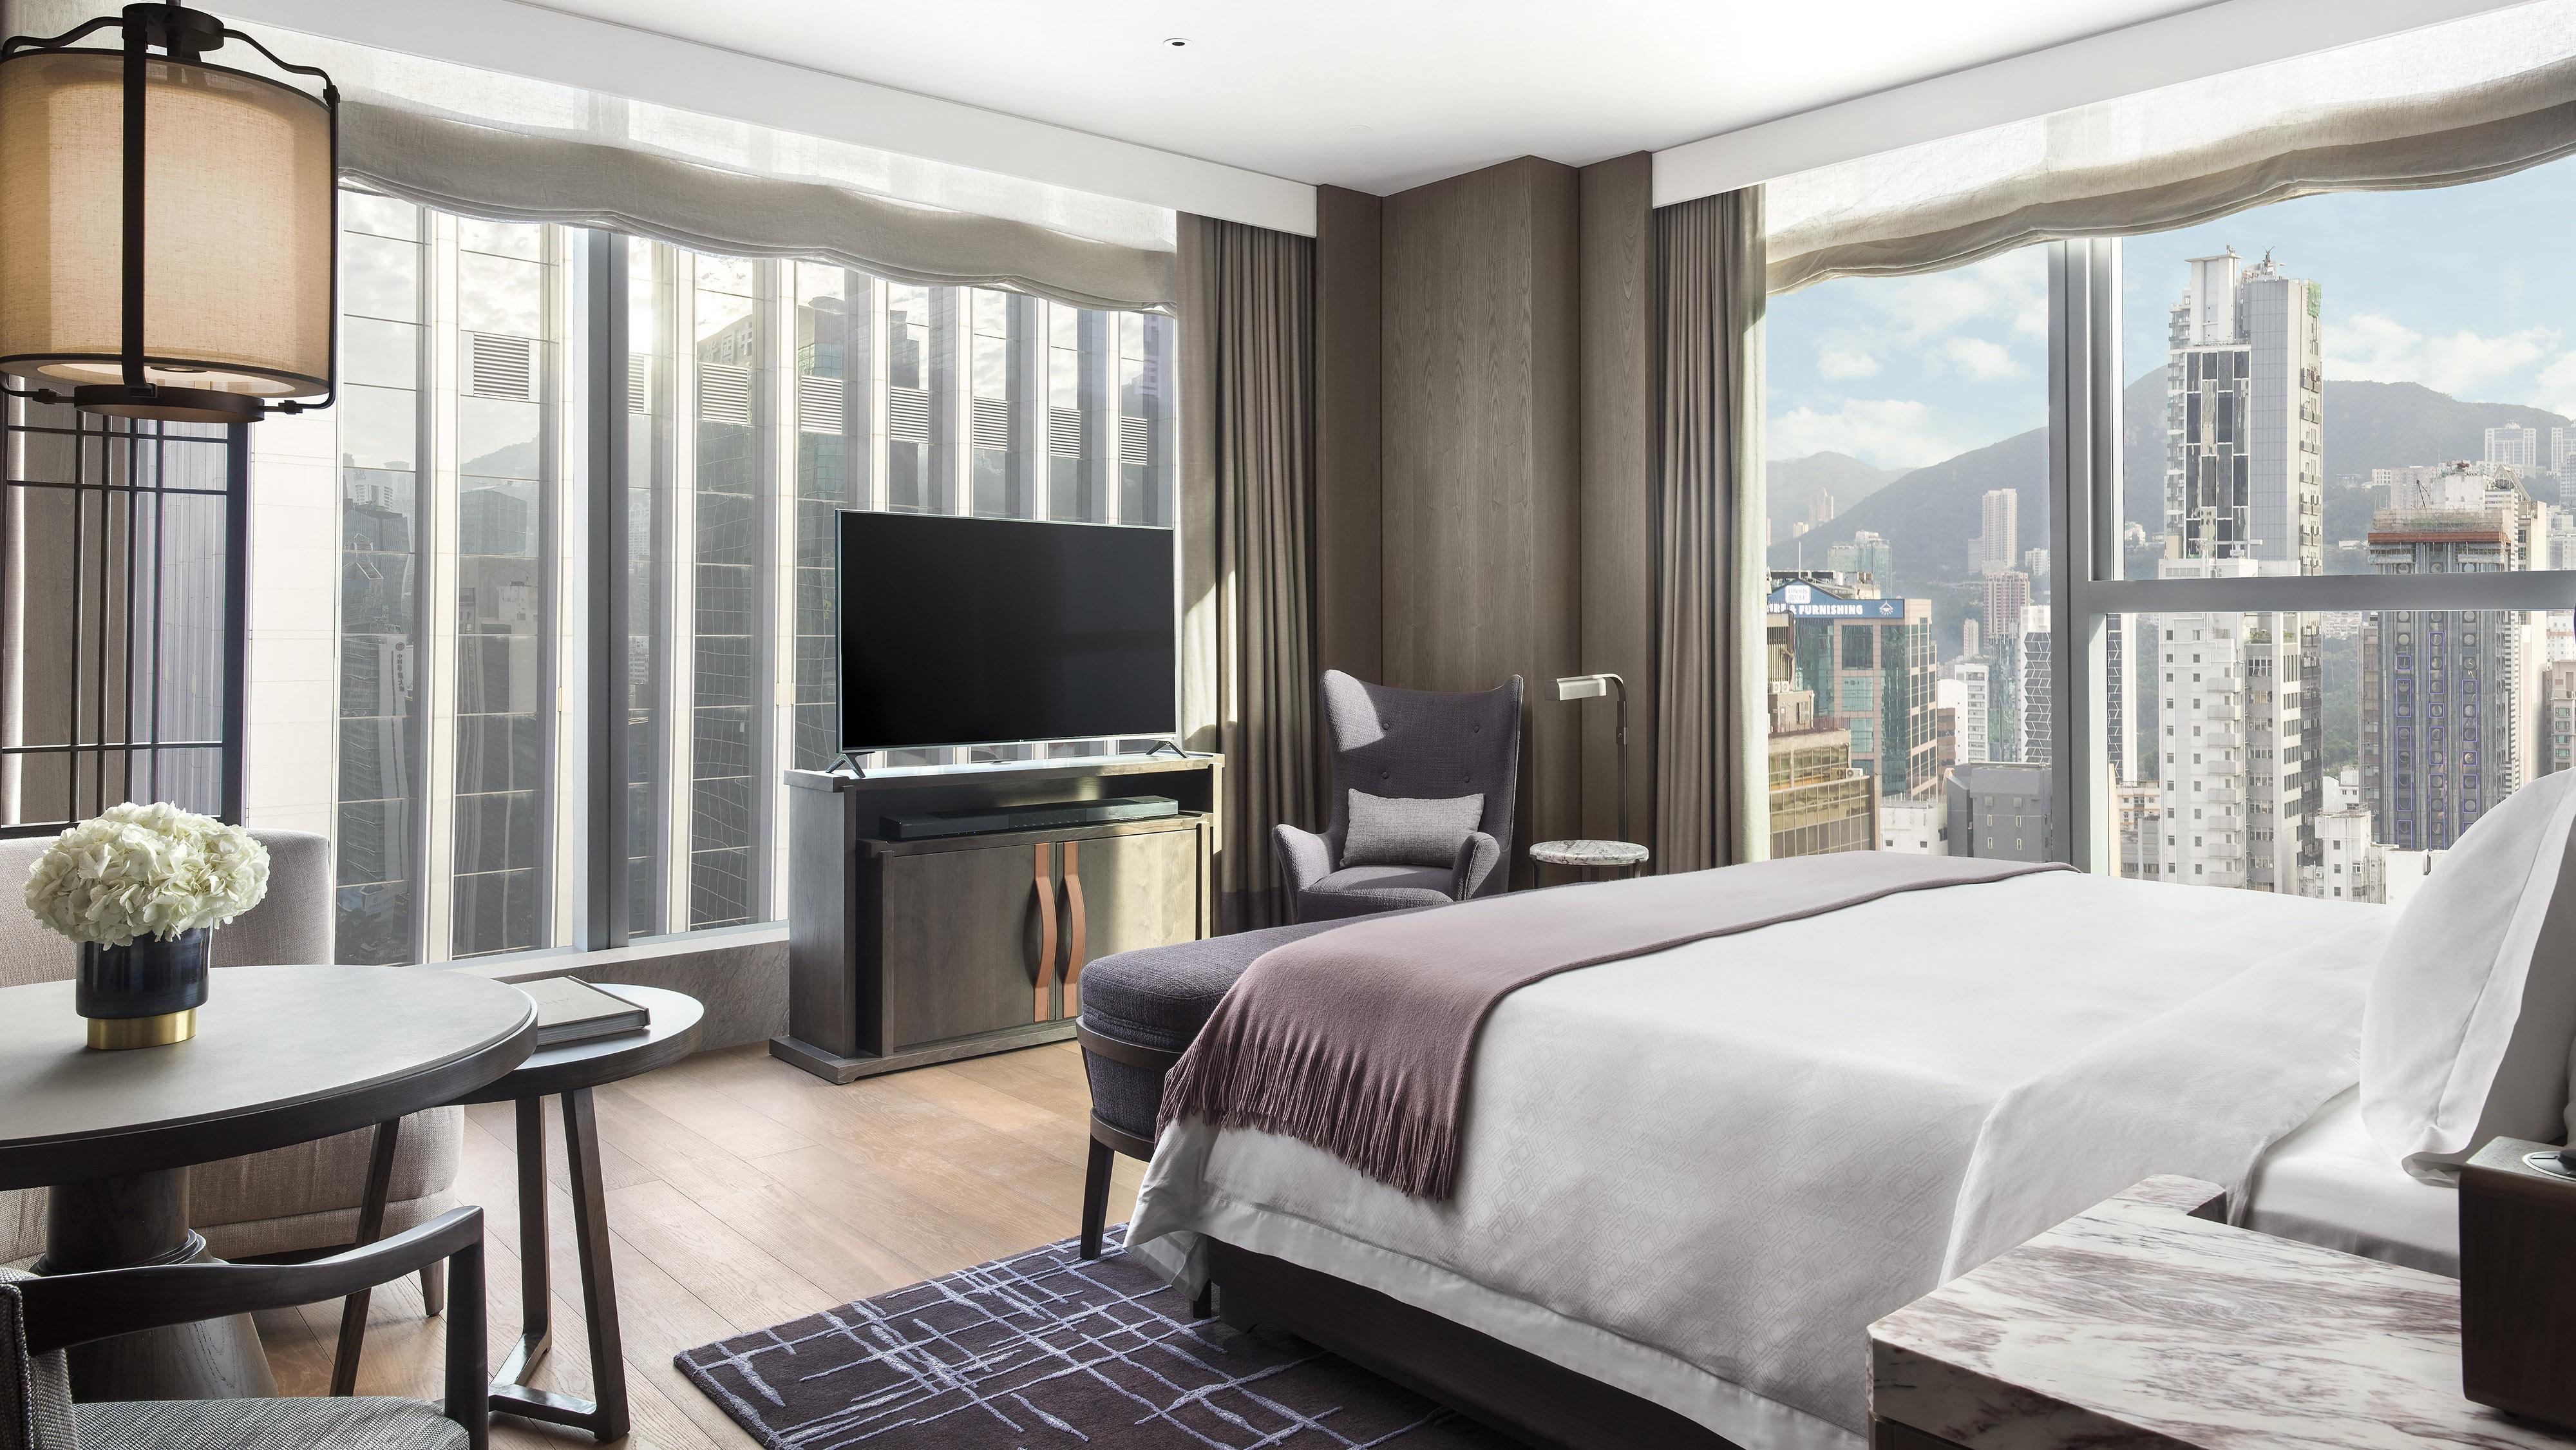 theluxurytravelexpert.com - Travel news: this month (April 2019) in luxury travel